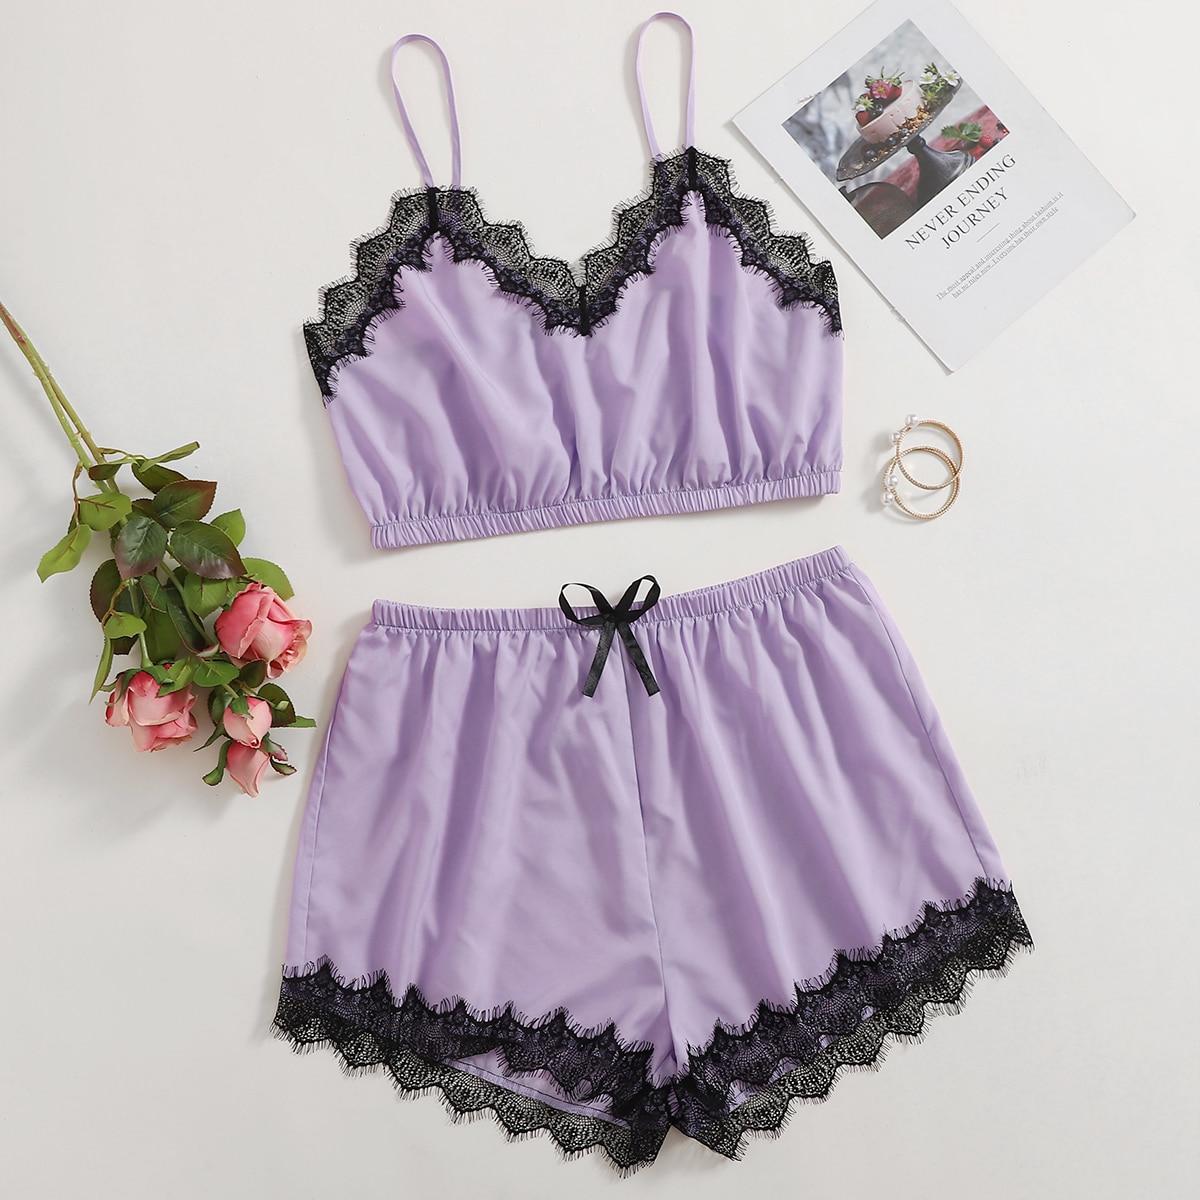 Контрастные кружева Контрастный цвет Сексуальный Пижама размер плюс